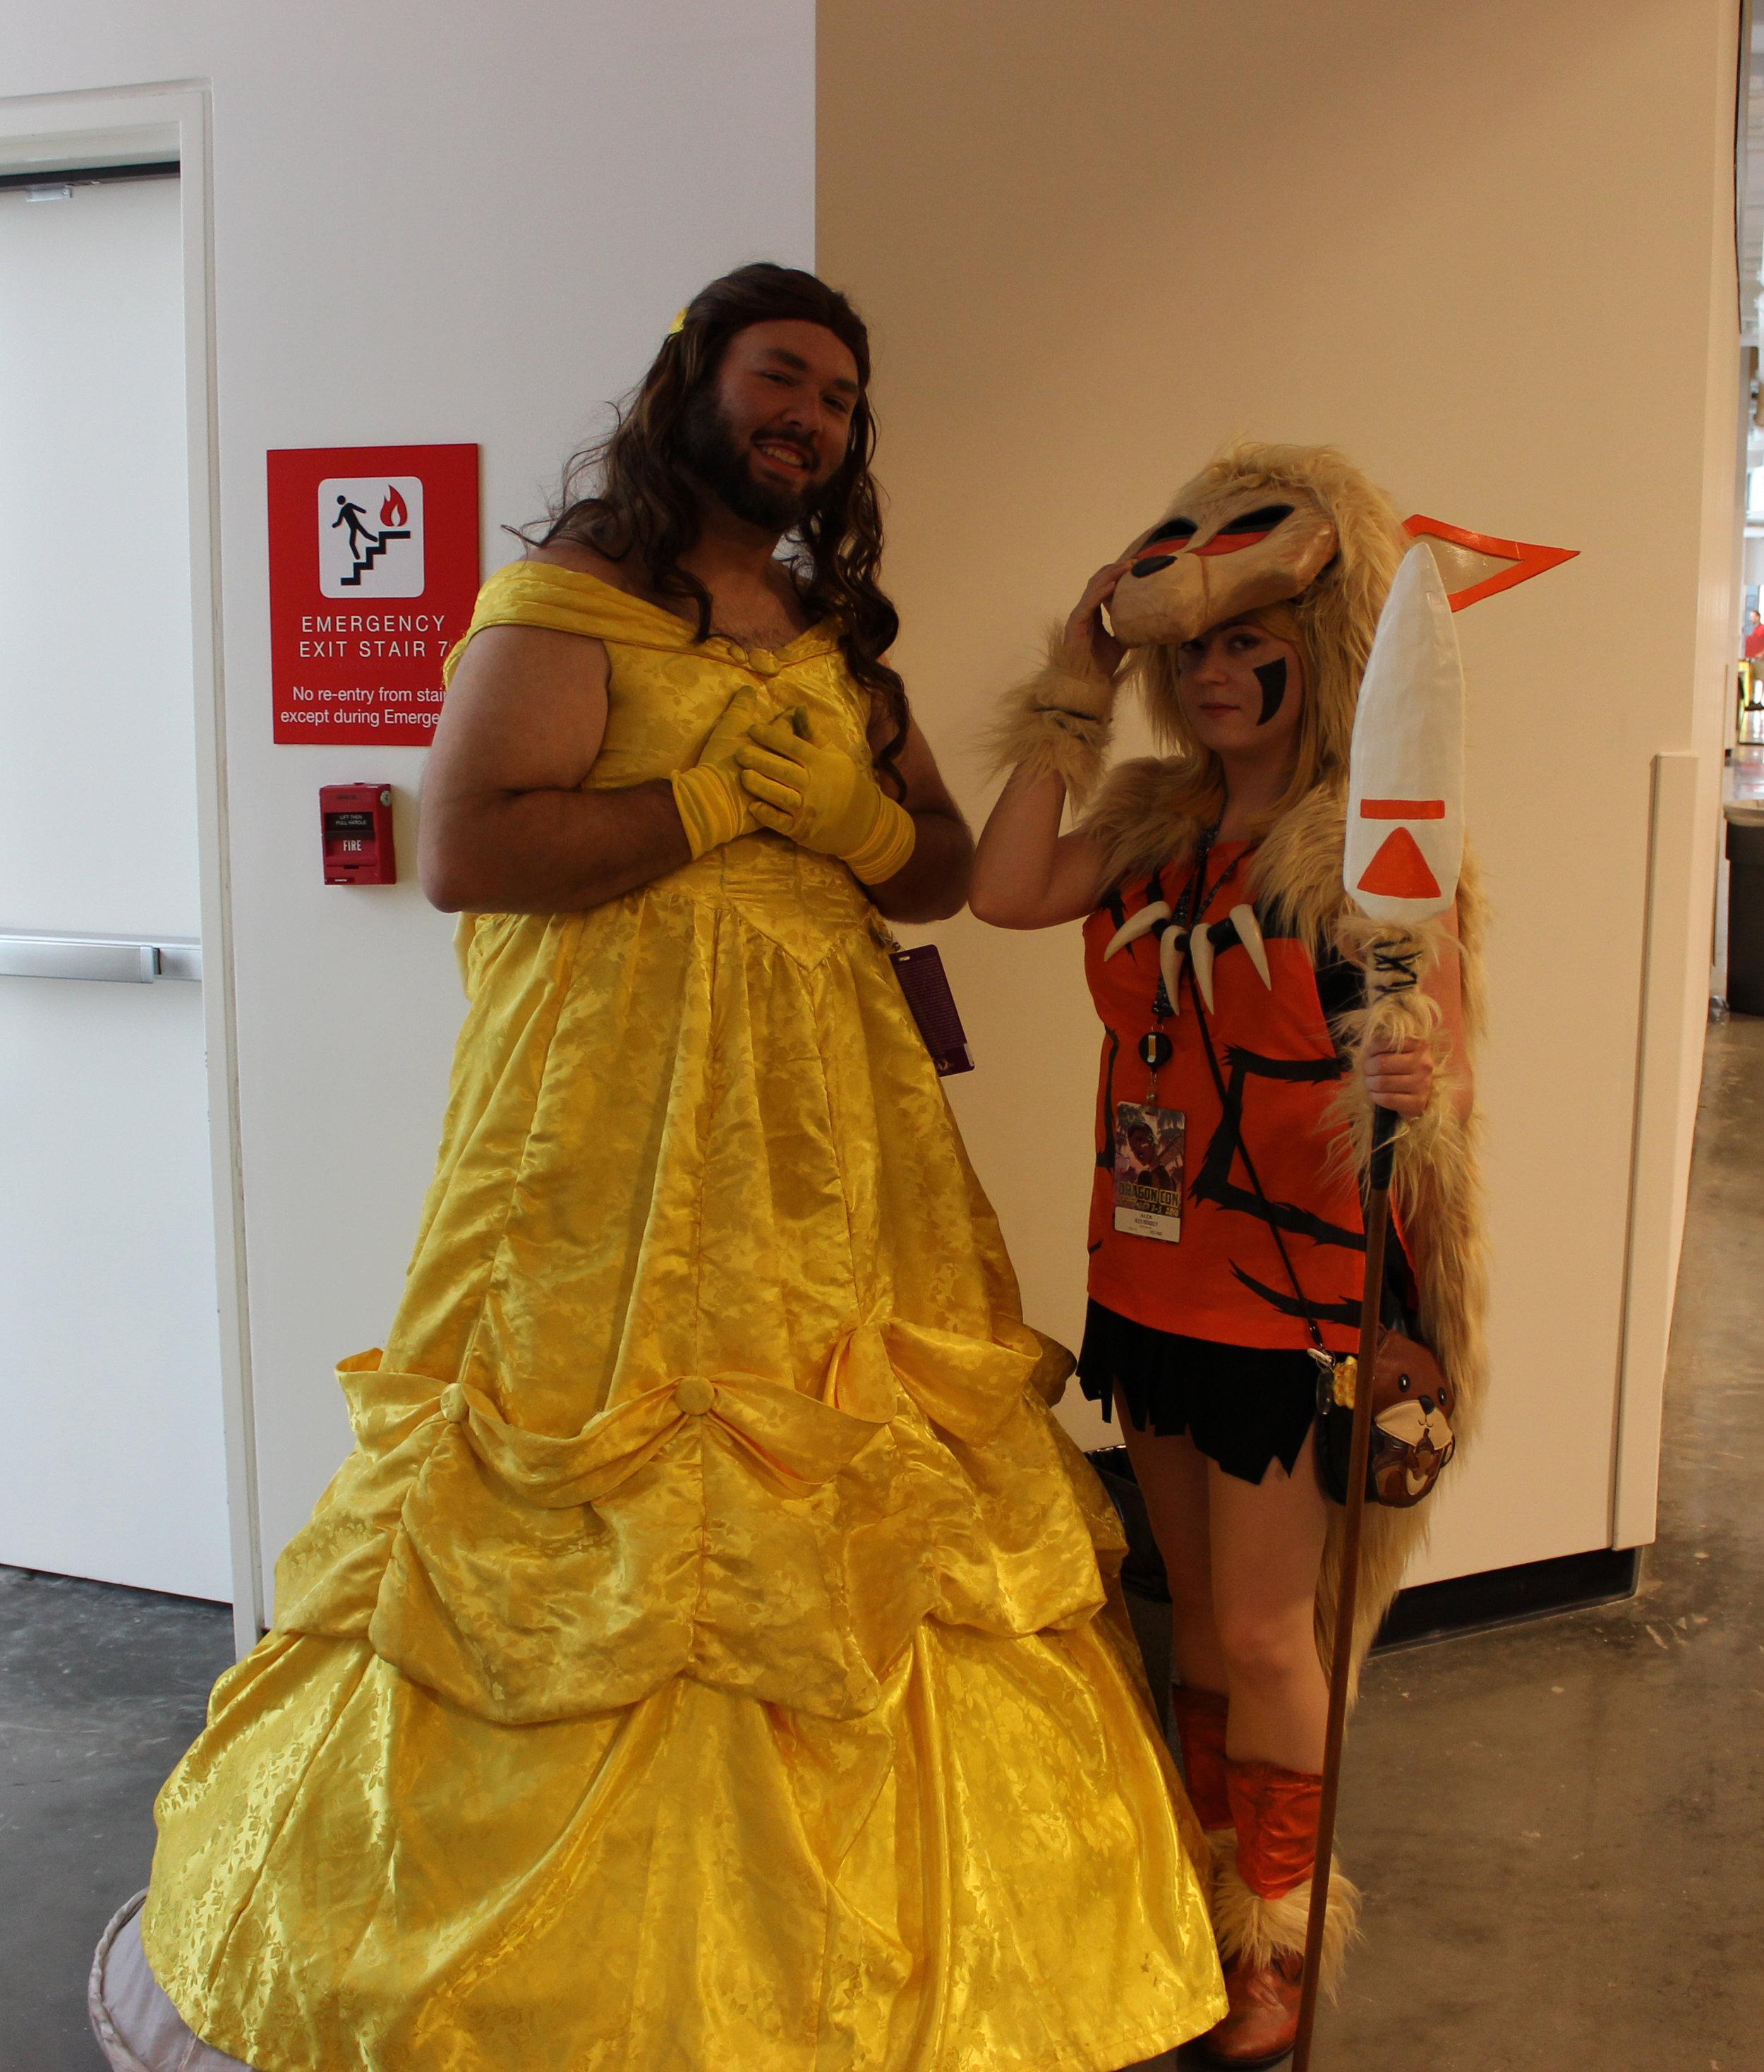 Man-Belle and Princess Mononoke/Arcanine Mix